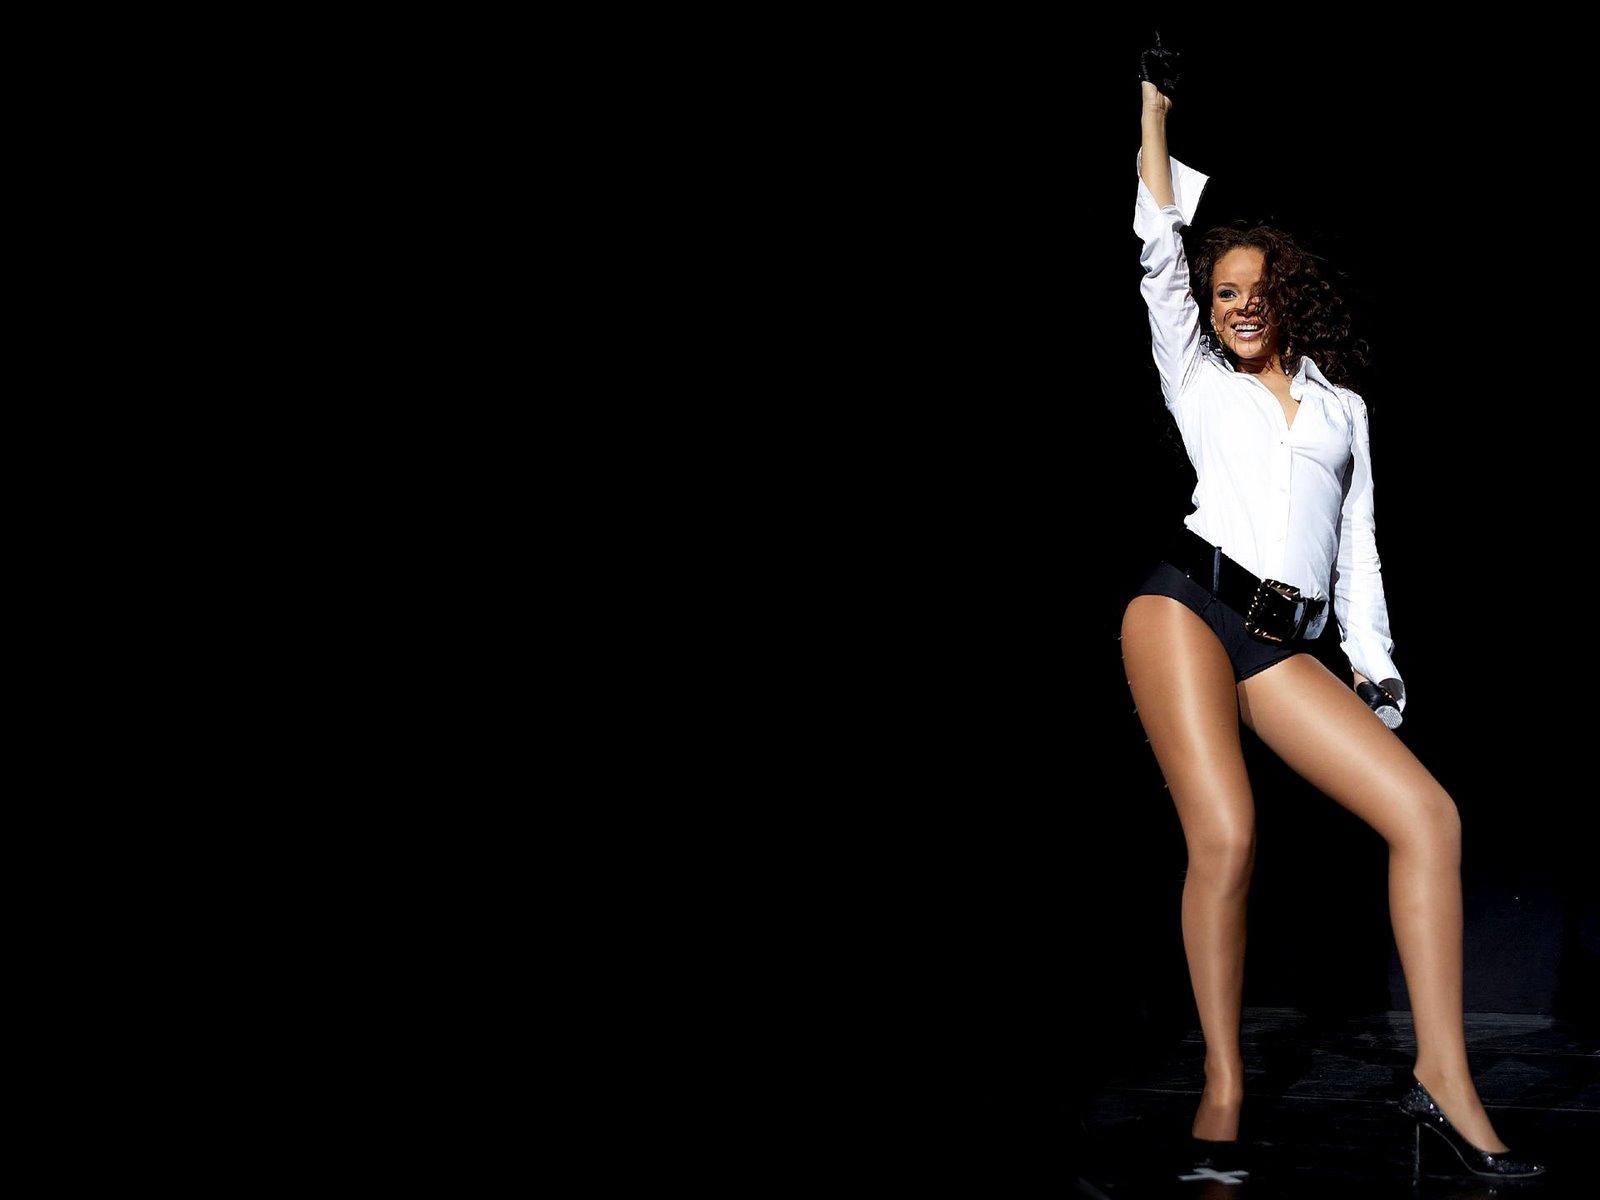 Rihanna Bikini Wallpapers Picture 2